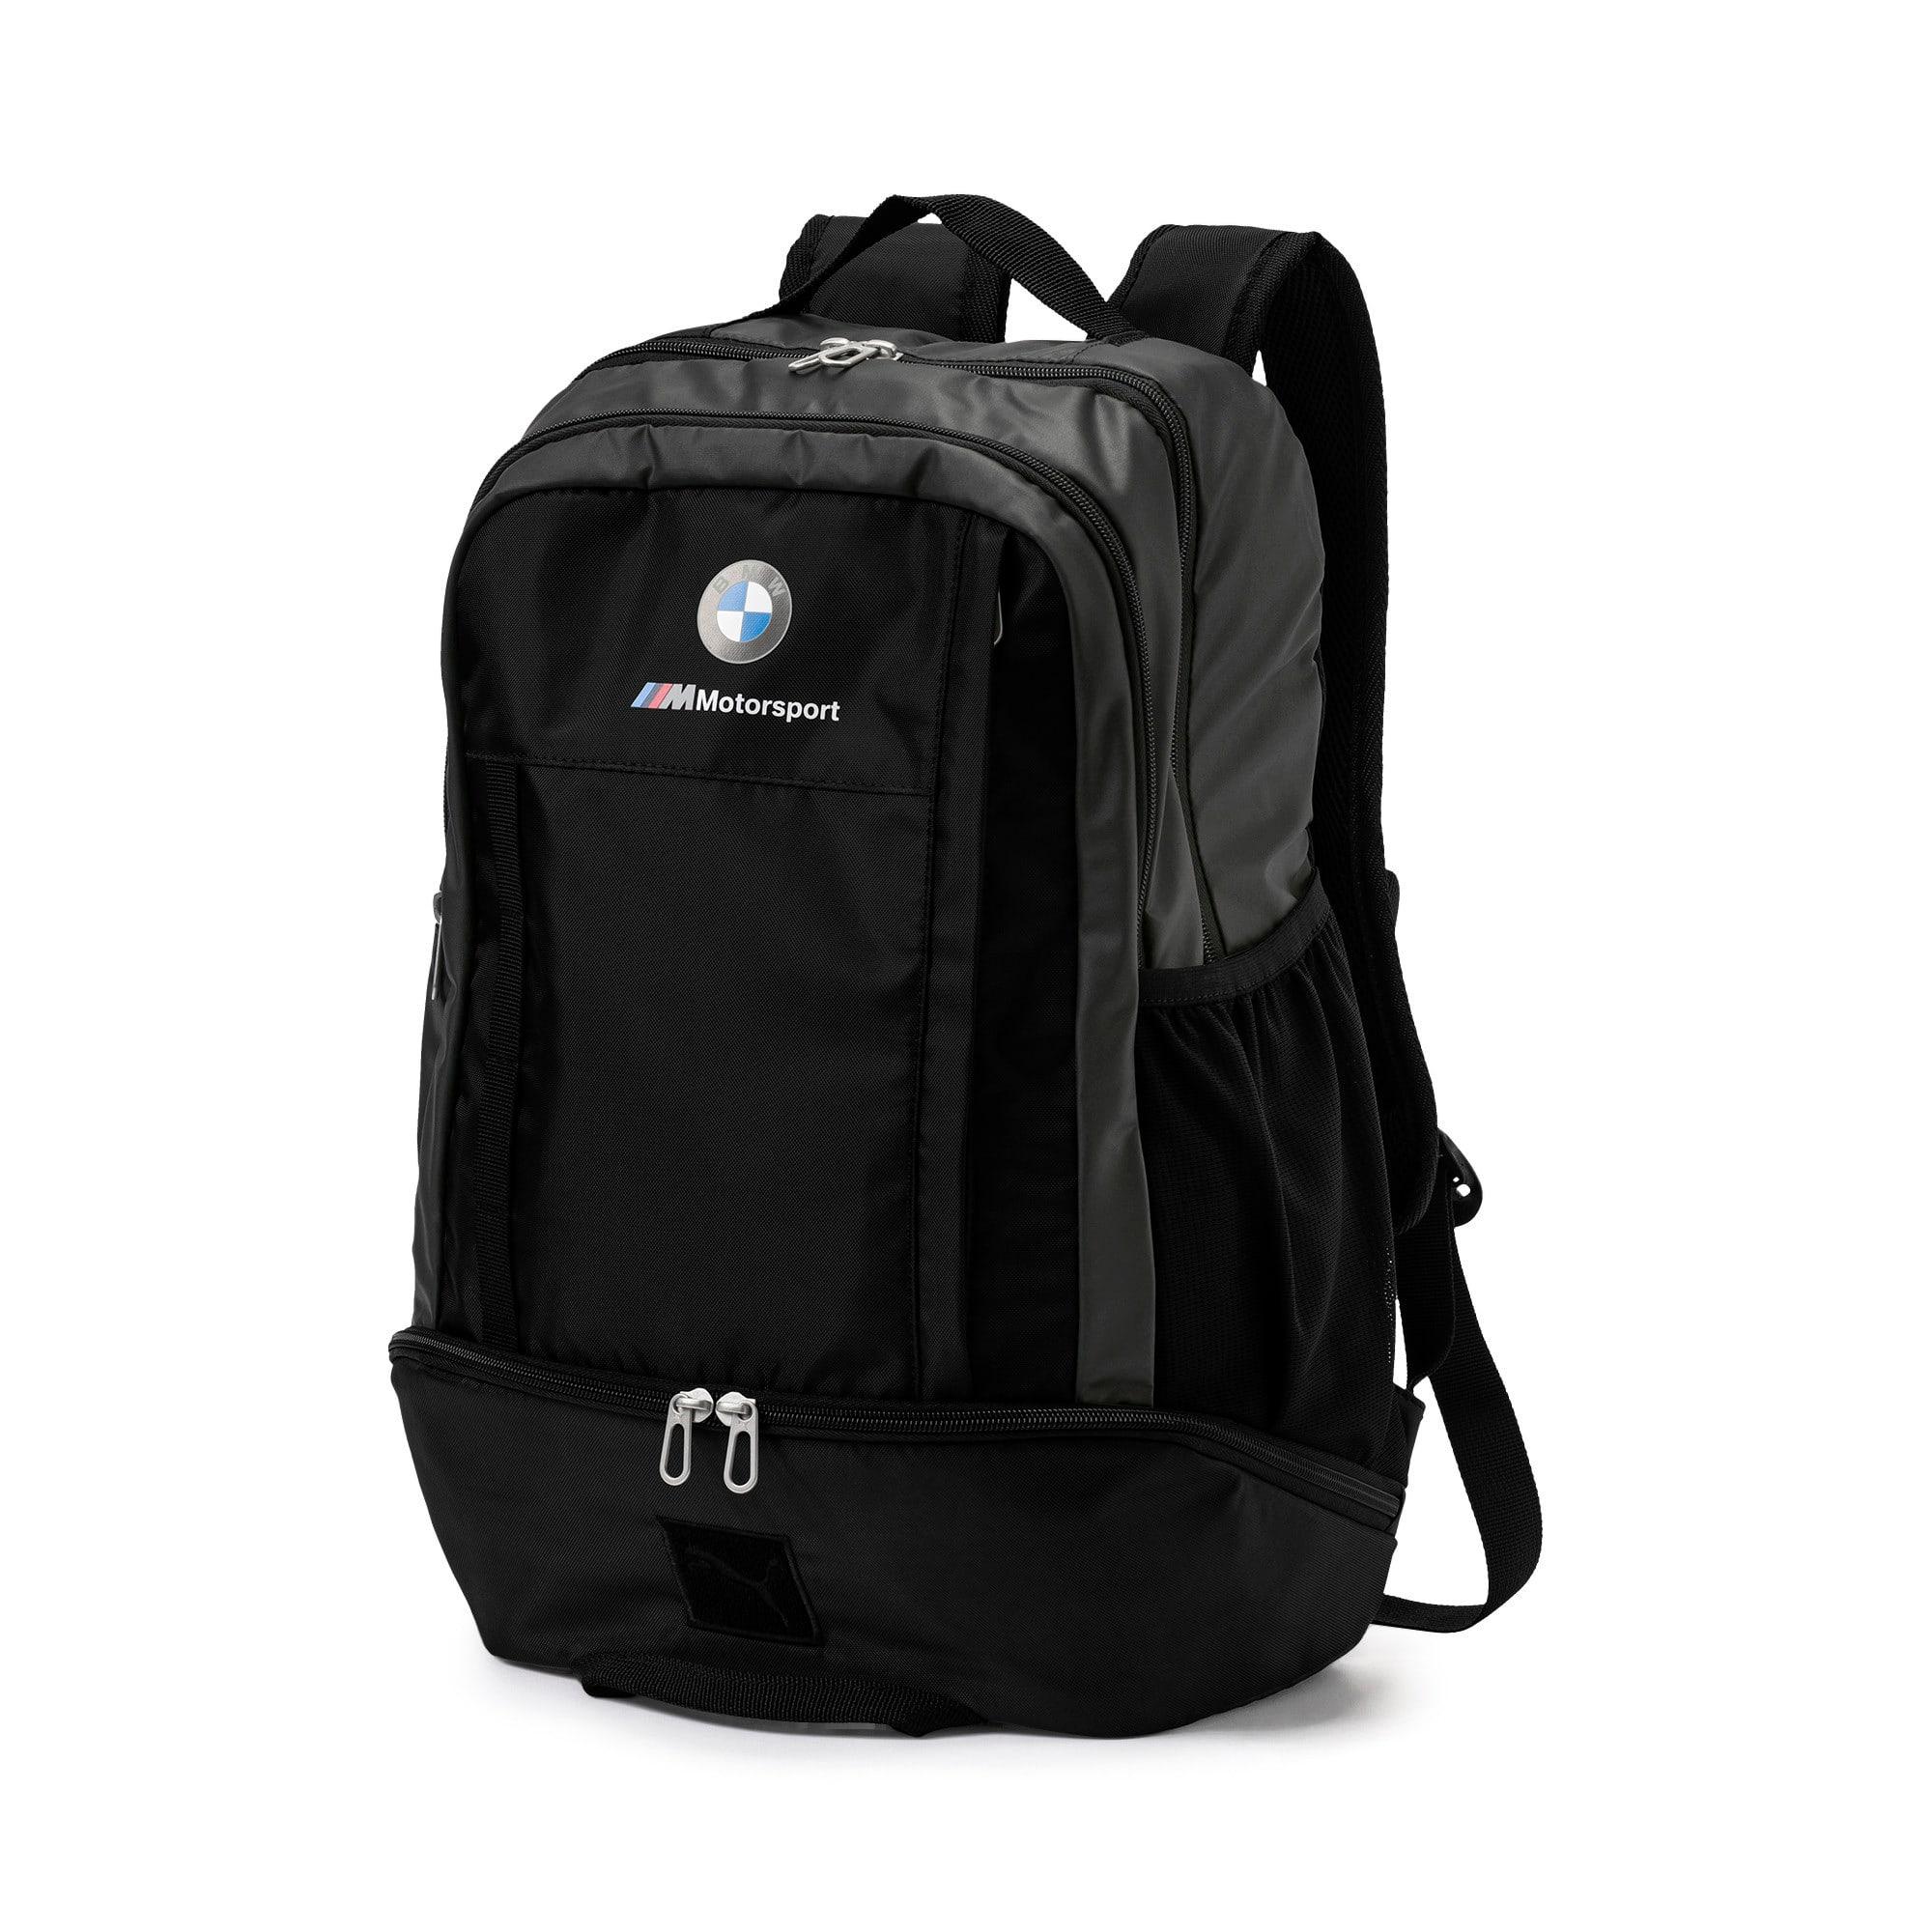 Thumbnail 1 of BMW M Motorsport RCT Backpack, Puma Black, medium